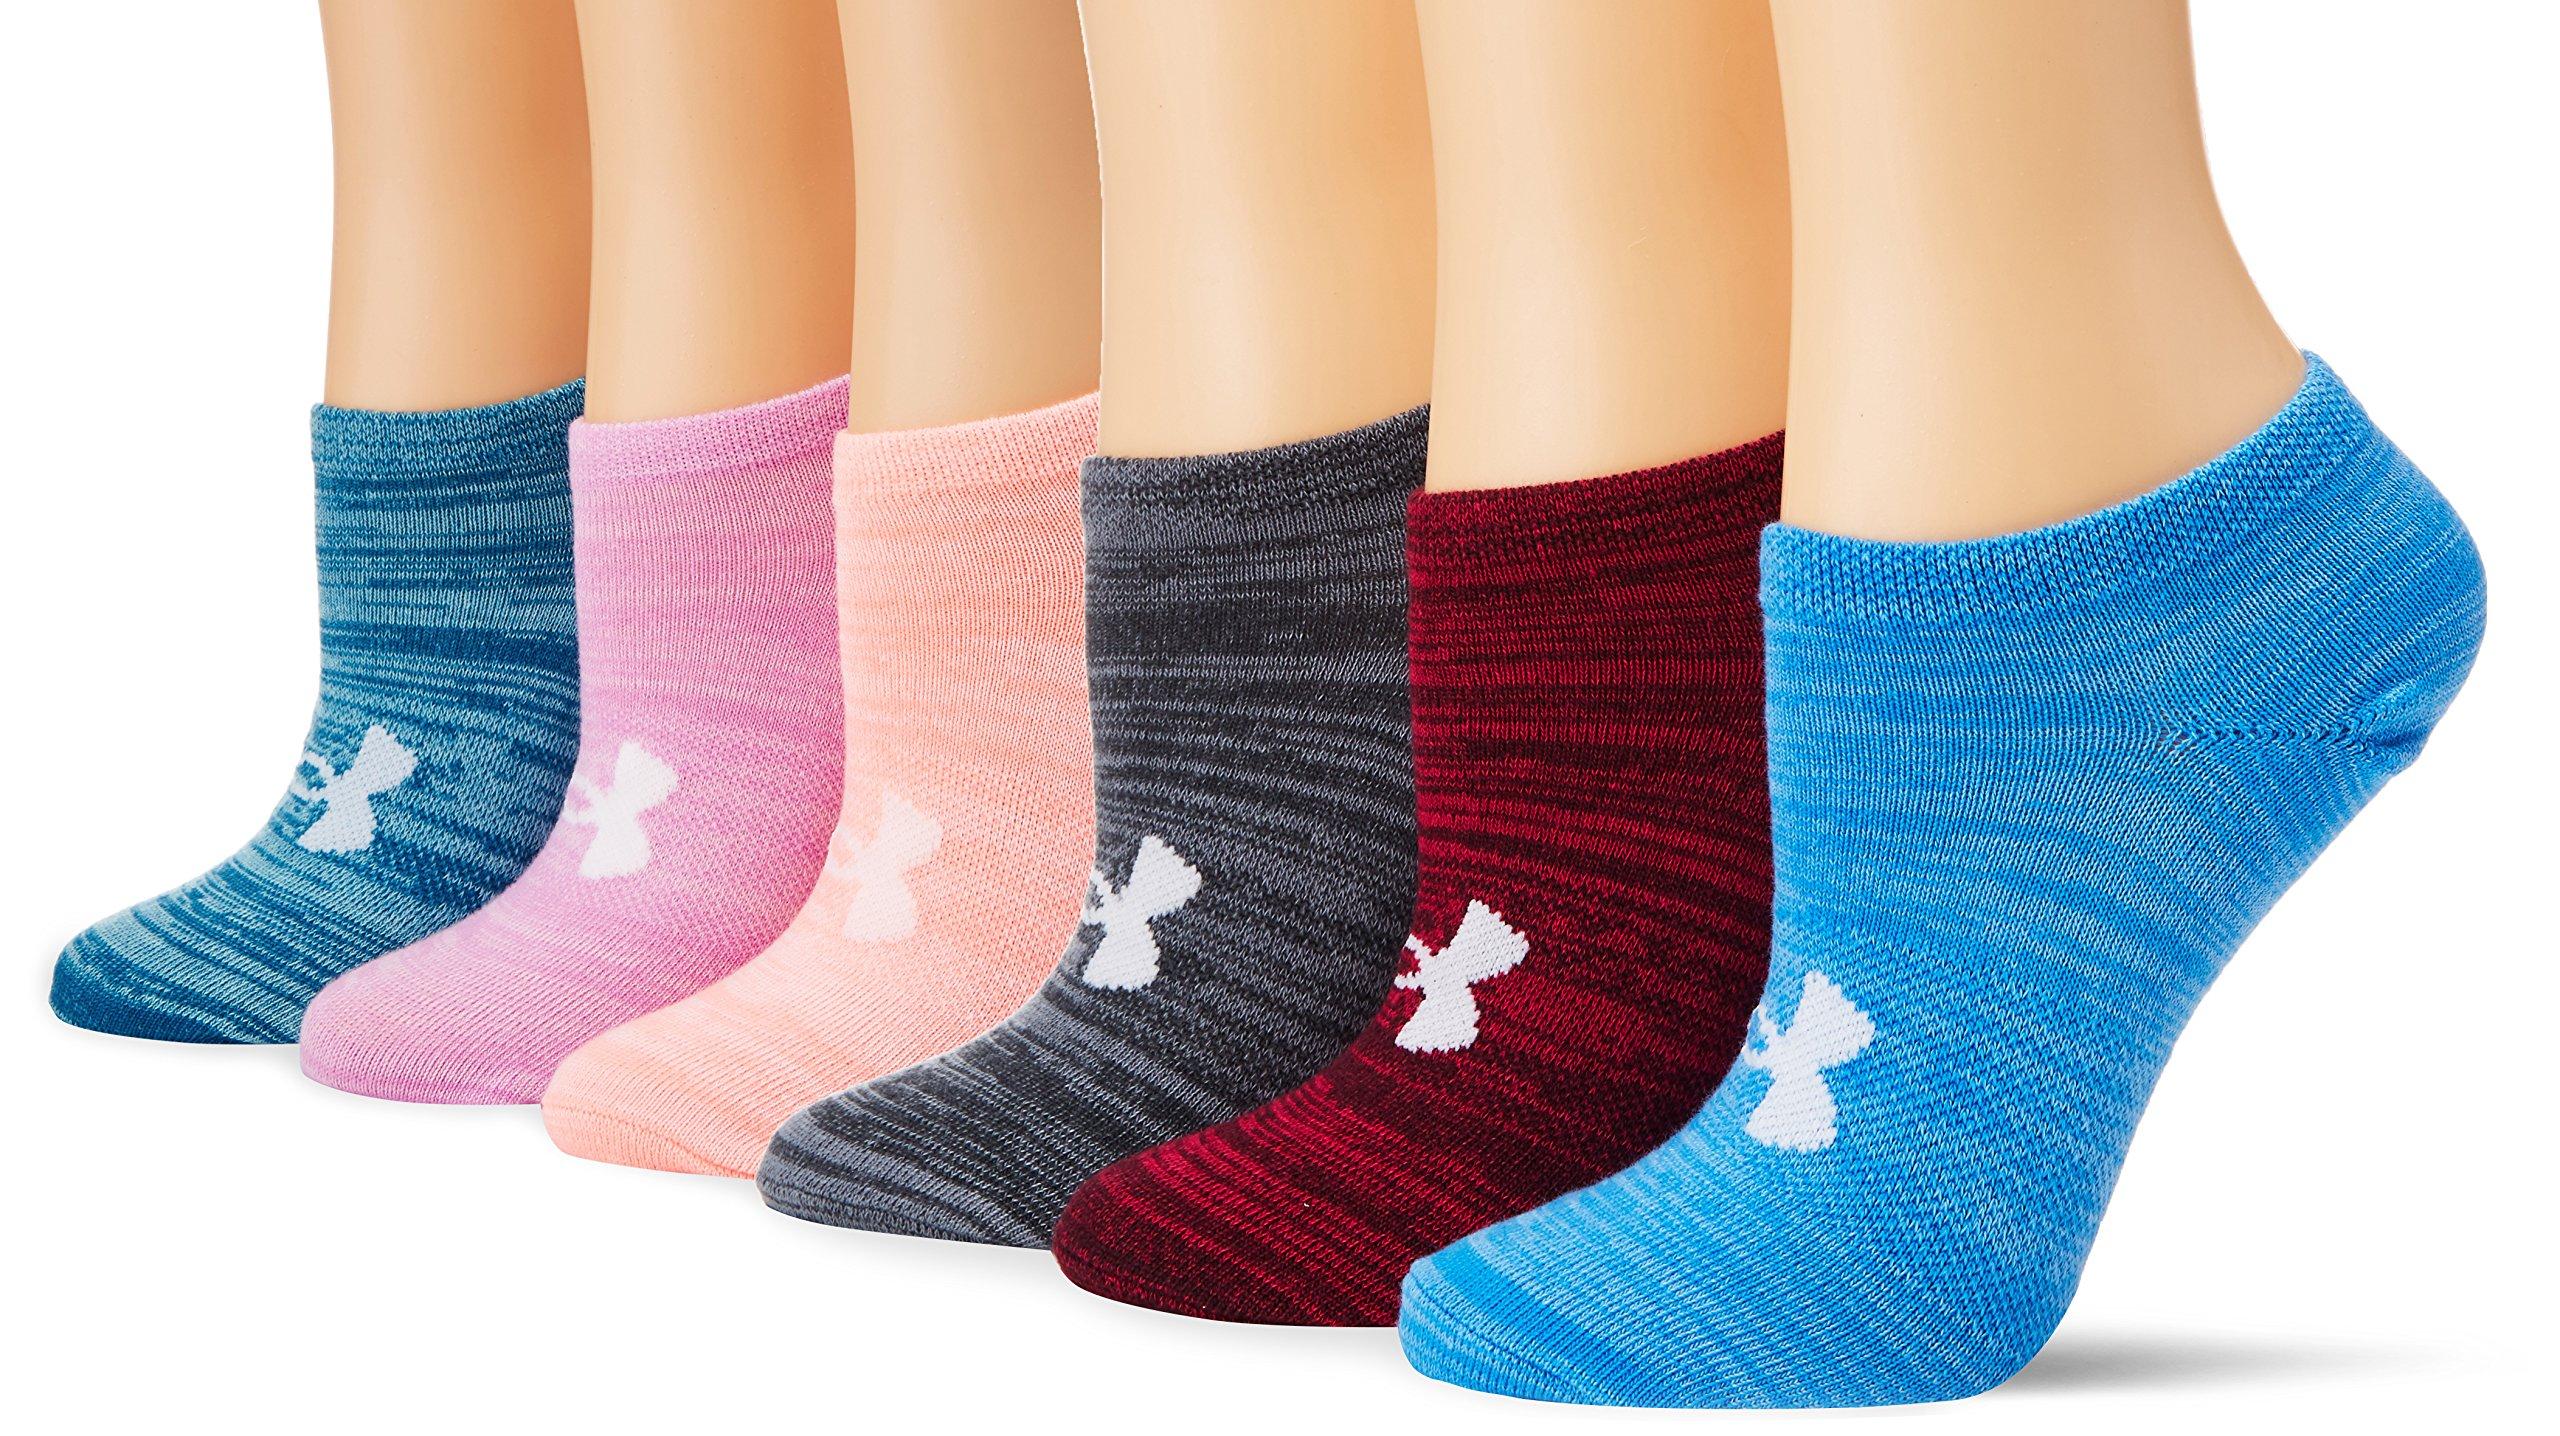 Under Armour Women's Essential Twist No Show Socks (6 Pack), Honeysuckle/Assorted, Medium by Under Armour